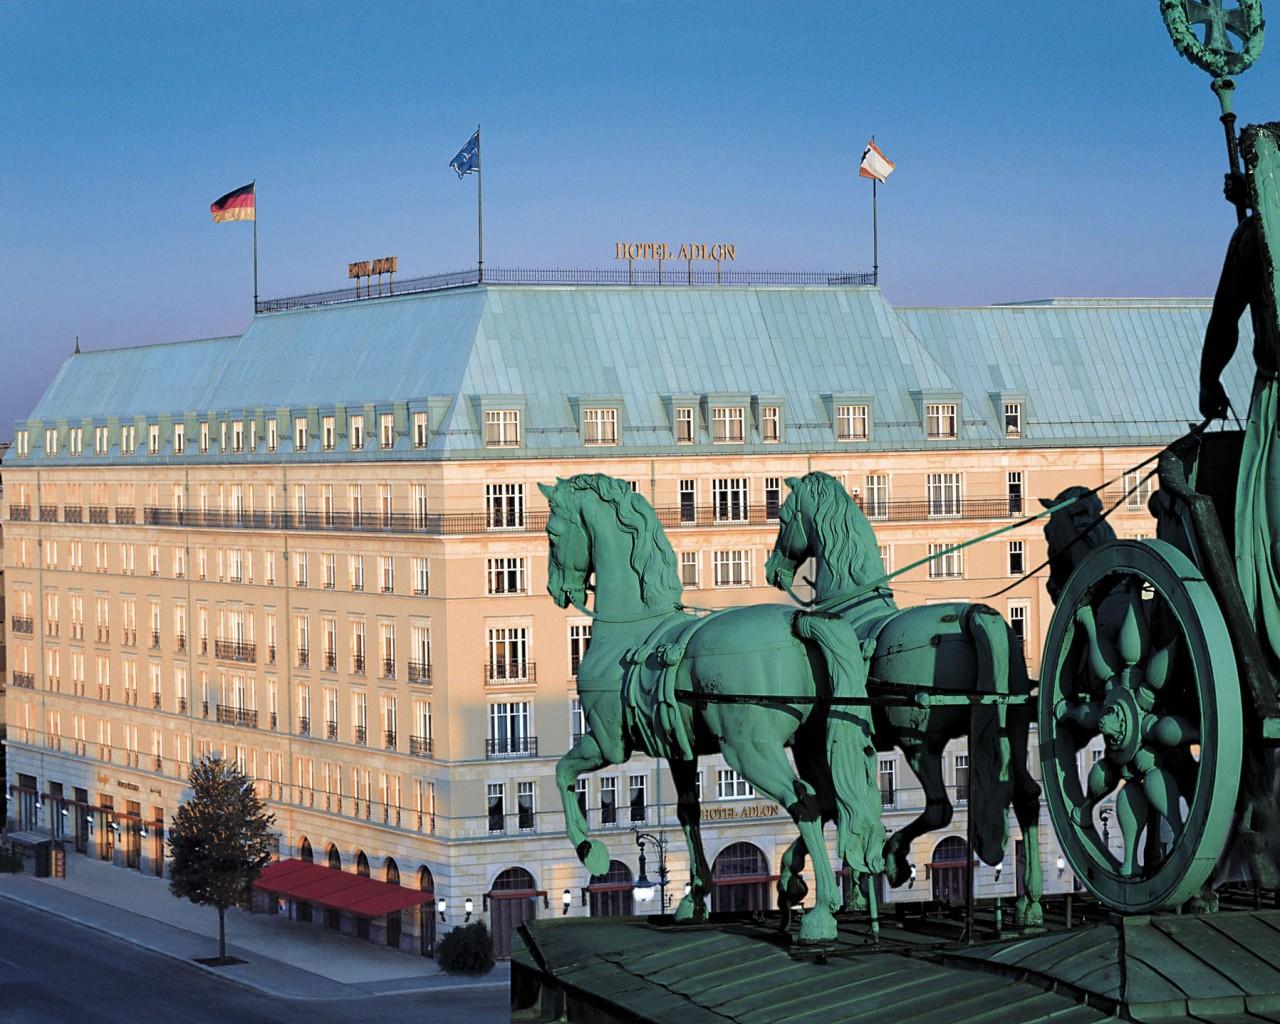 816890a2e1 自1907年開幕以來,柏林的阿德羅恩酒店(Hotel Adlon  Berlin)[註27]傳奇地復活了,不幸的是它於1945年被摧毀,它可說是柏林的象徵。這座豪華的酒店冠蓋雲集,吸引了 ...